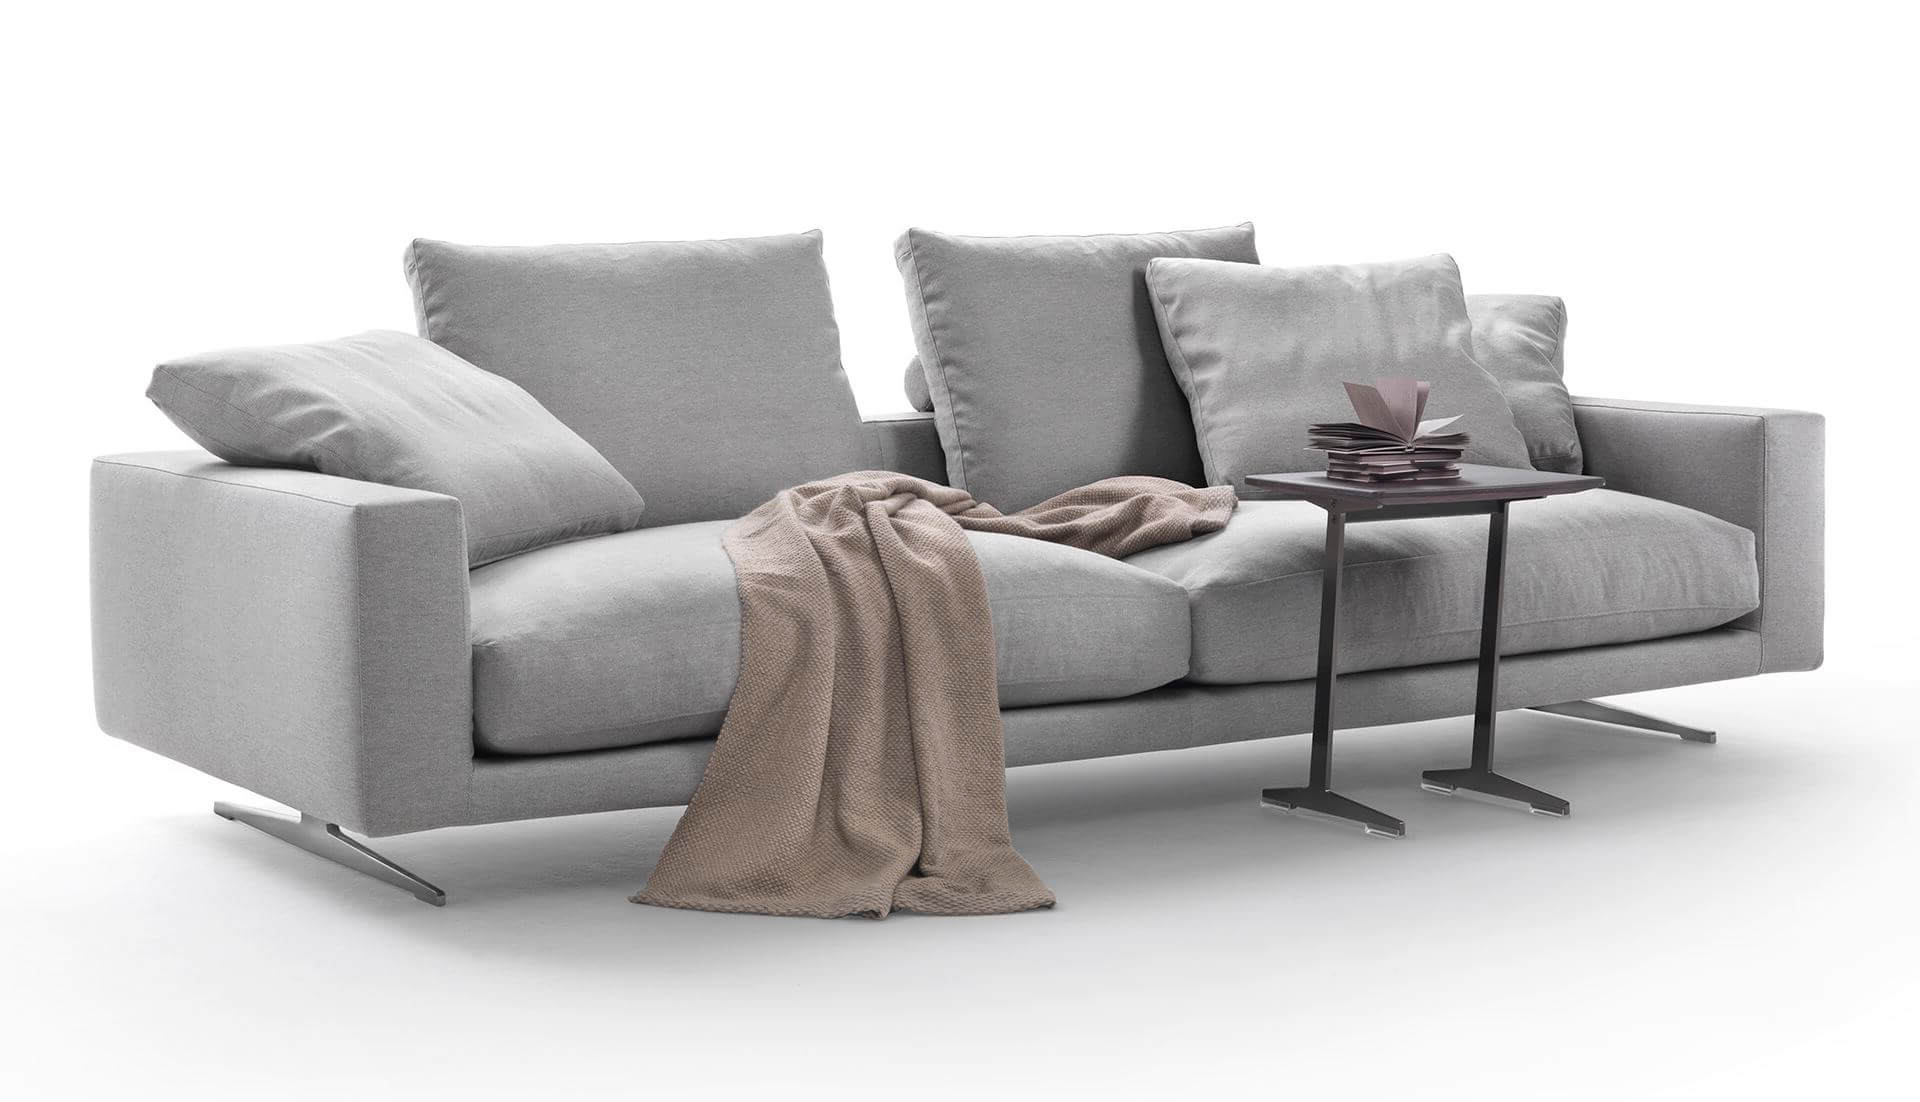 Dream Navy 3 Piece Modular Sofas For Preferred Flexform Campiello Modular Sofa – Dream Design Interiors Ltd (View 5 of 20)